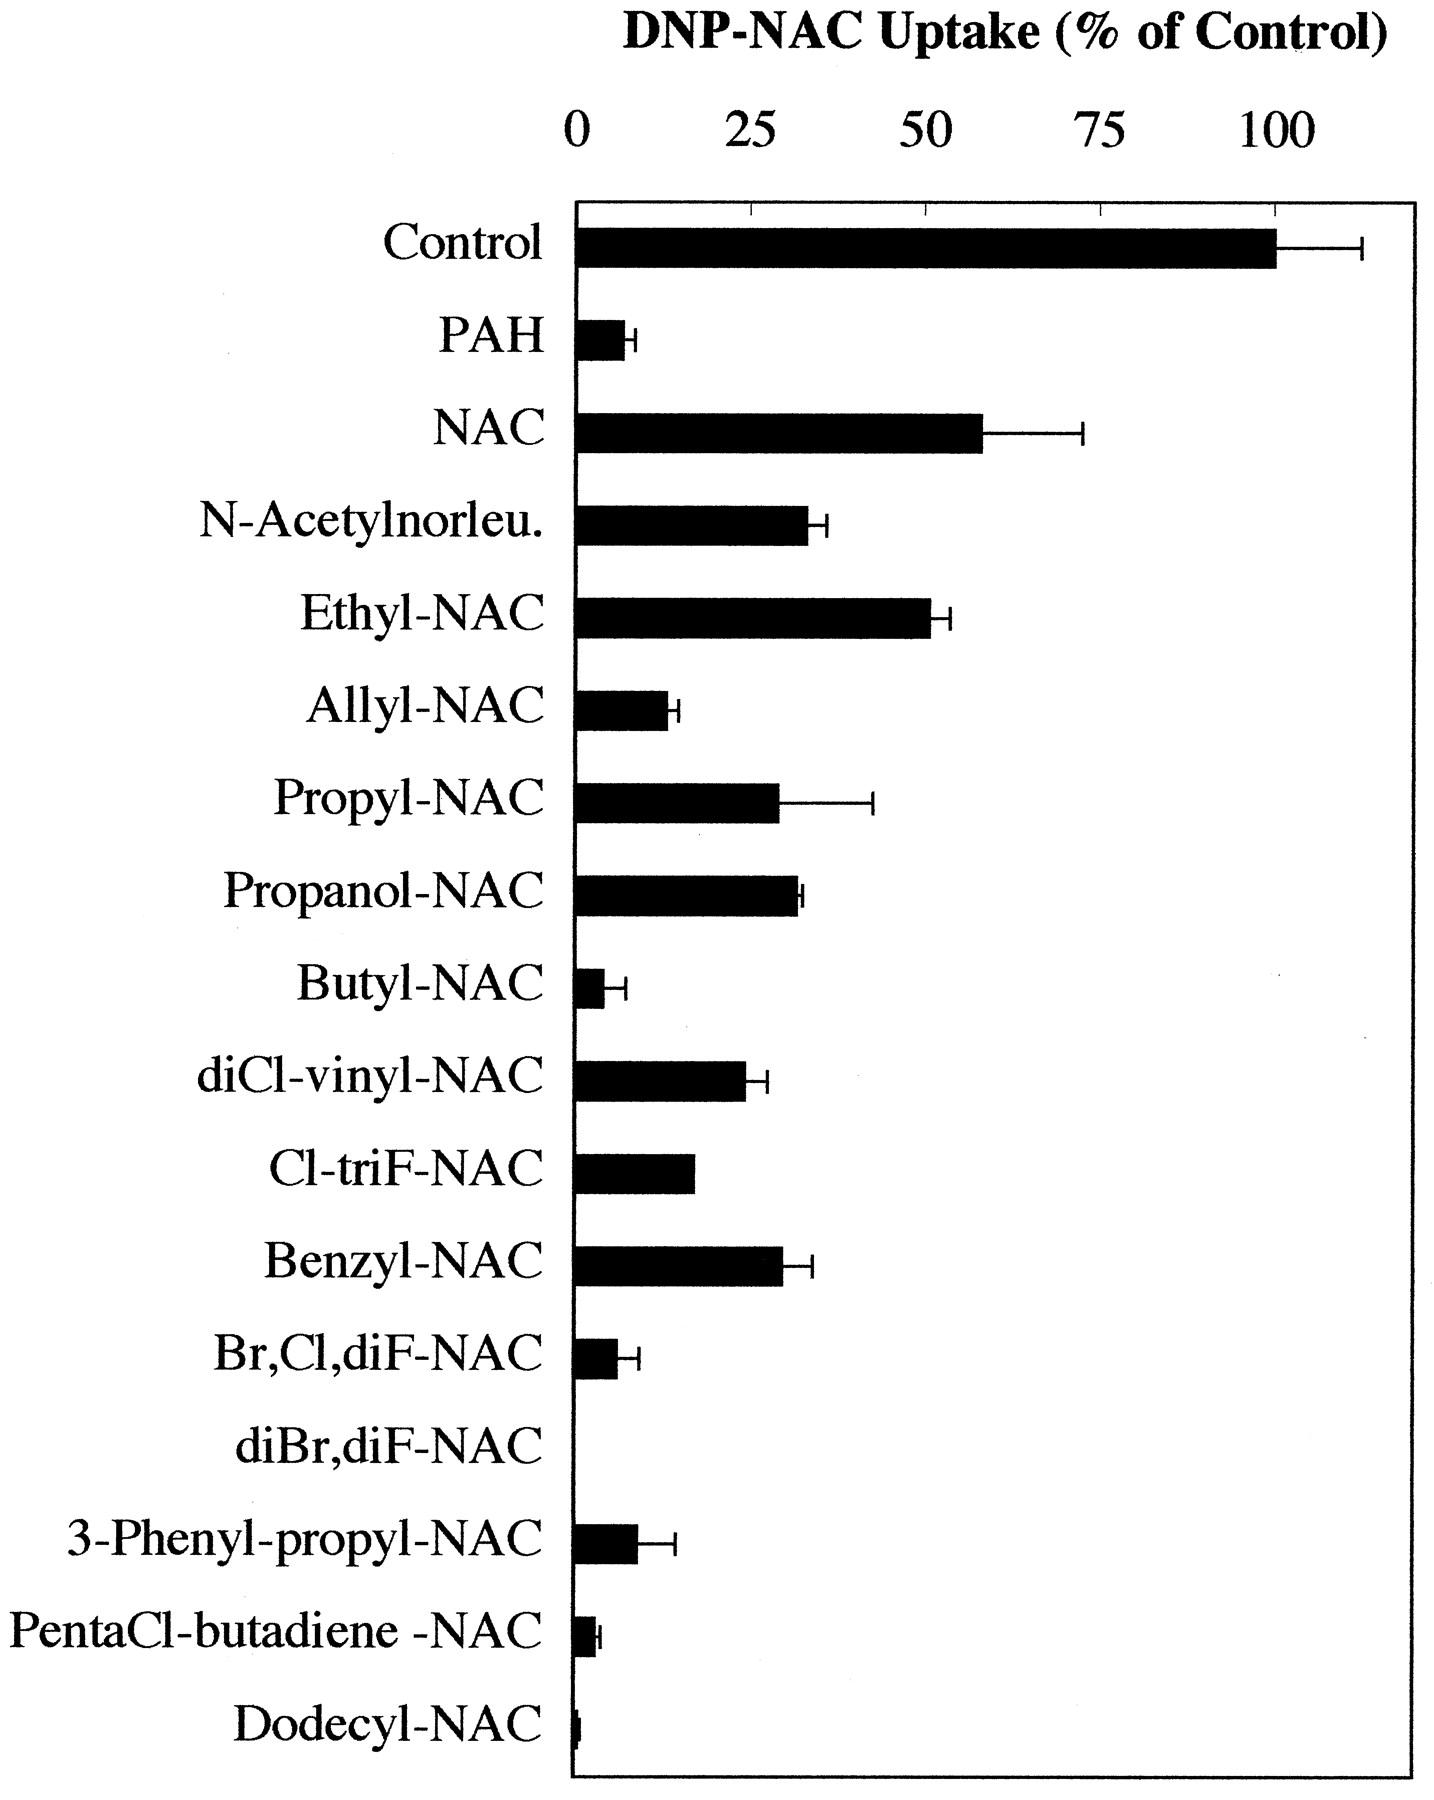 Mercapturic Acids (N-AcetylcysteineS-Conjugates) as Endogenous